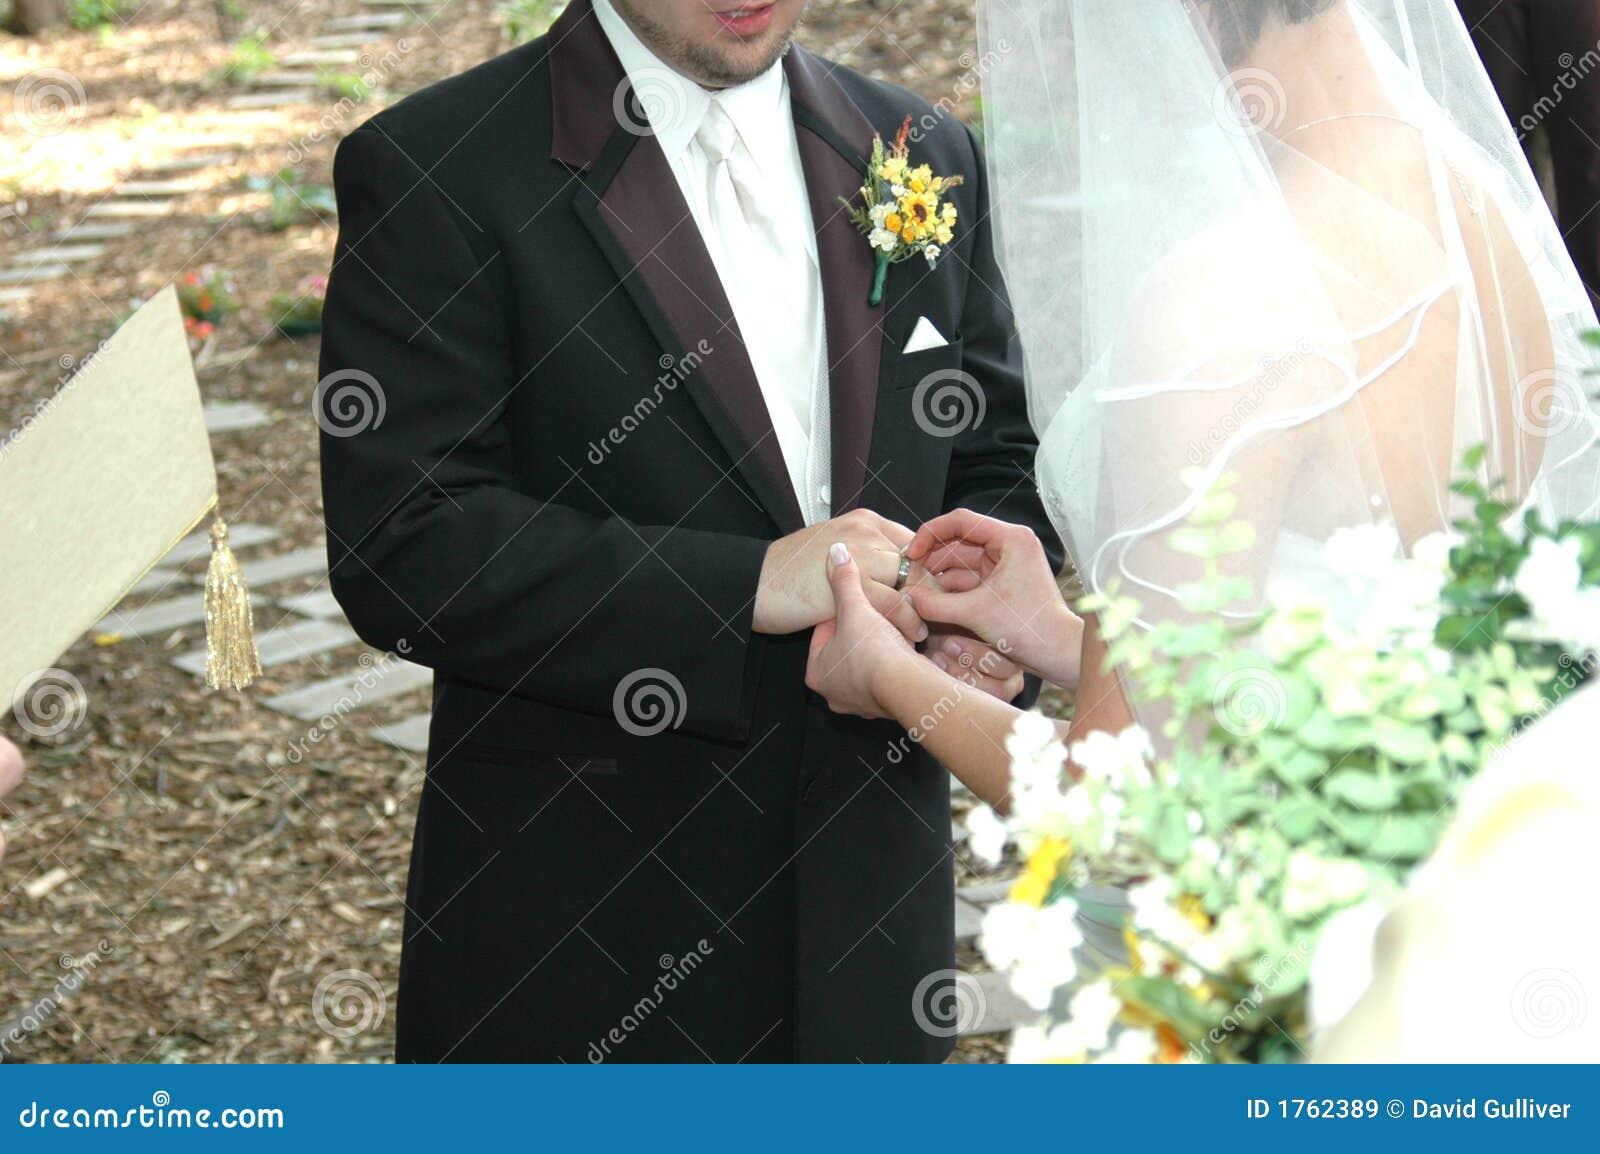 Wedding Ring Ceremony Royalty Free Stock Images Image 1762389